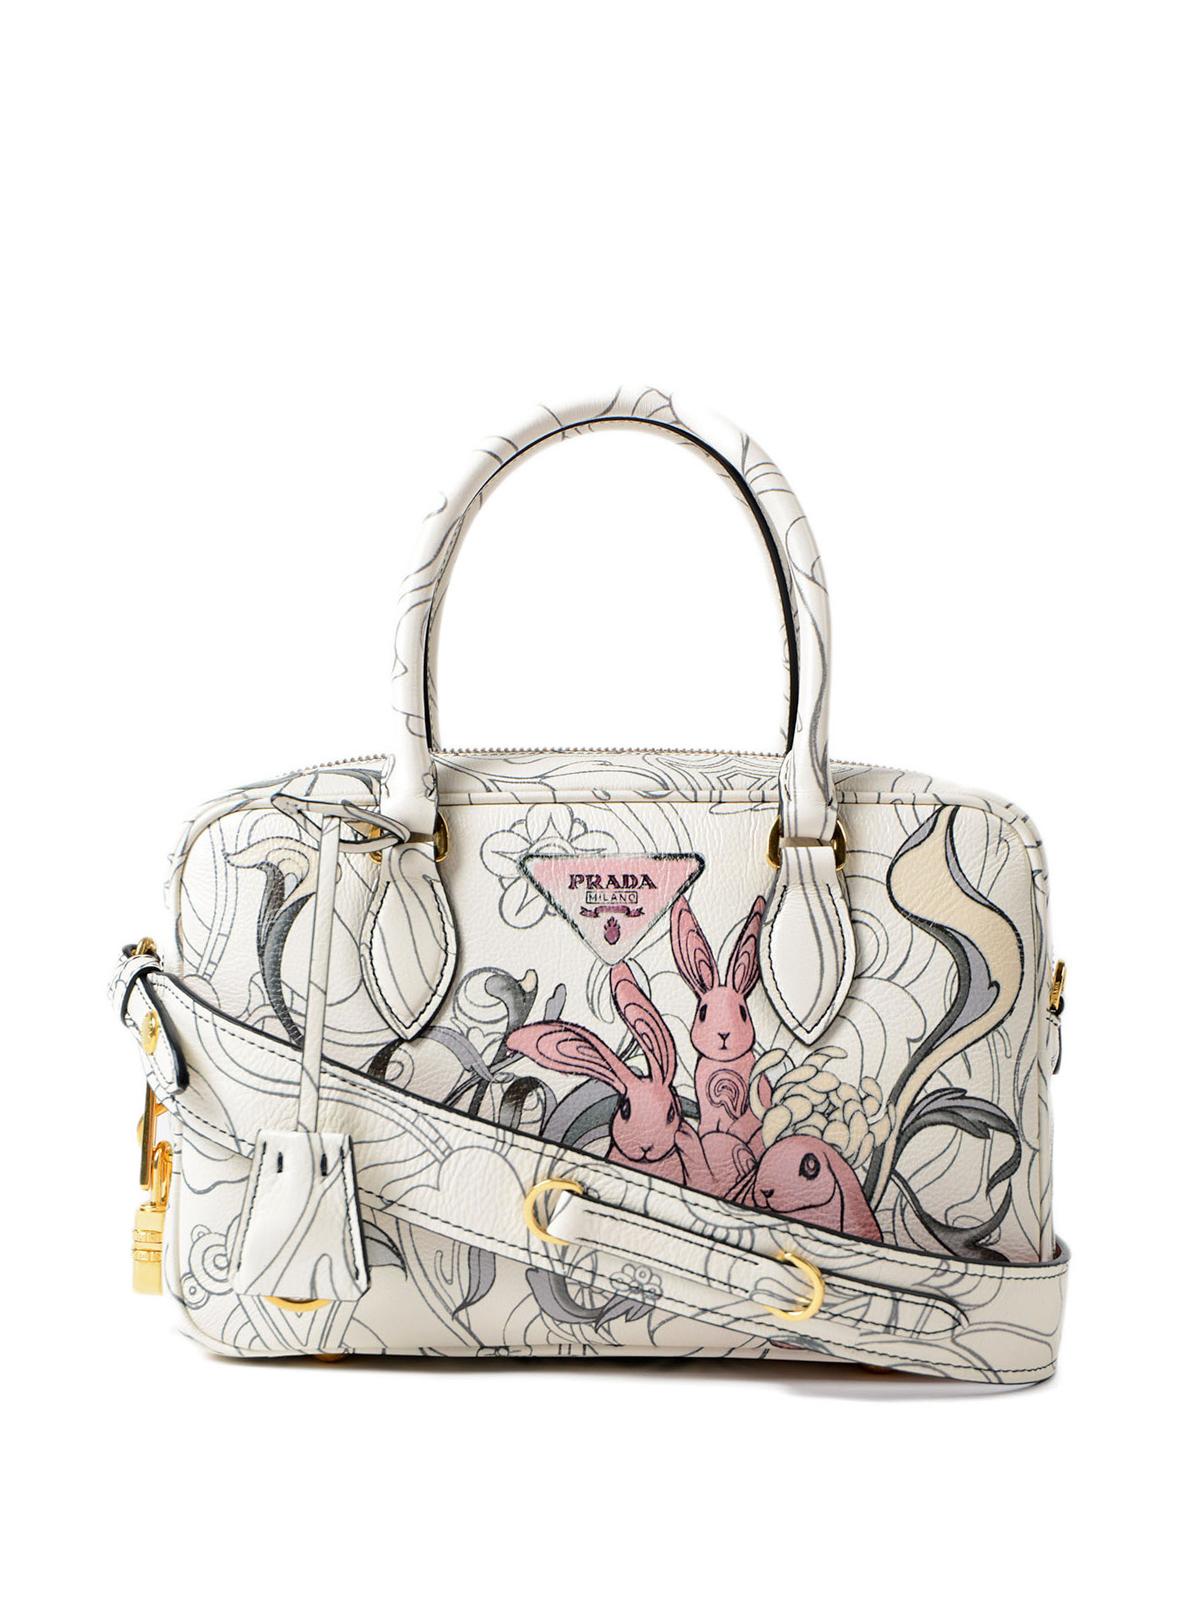 8159a951b3e1 Prada - Rabbit print leather small handbag - bowling bags ...